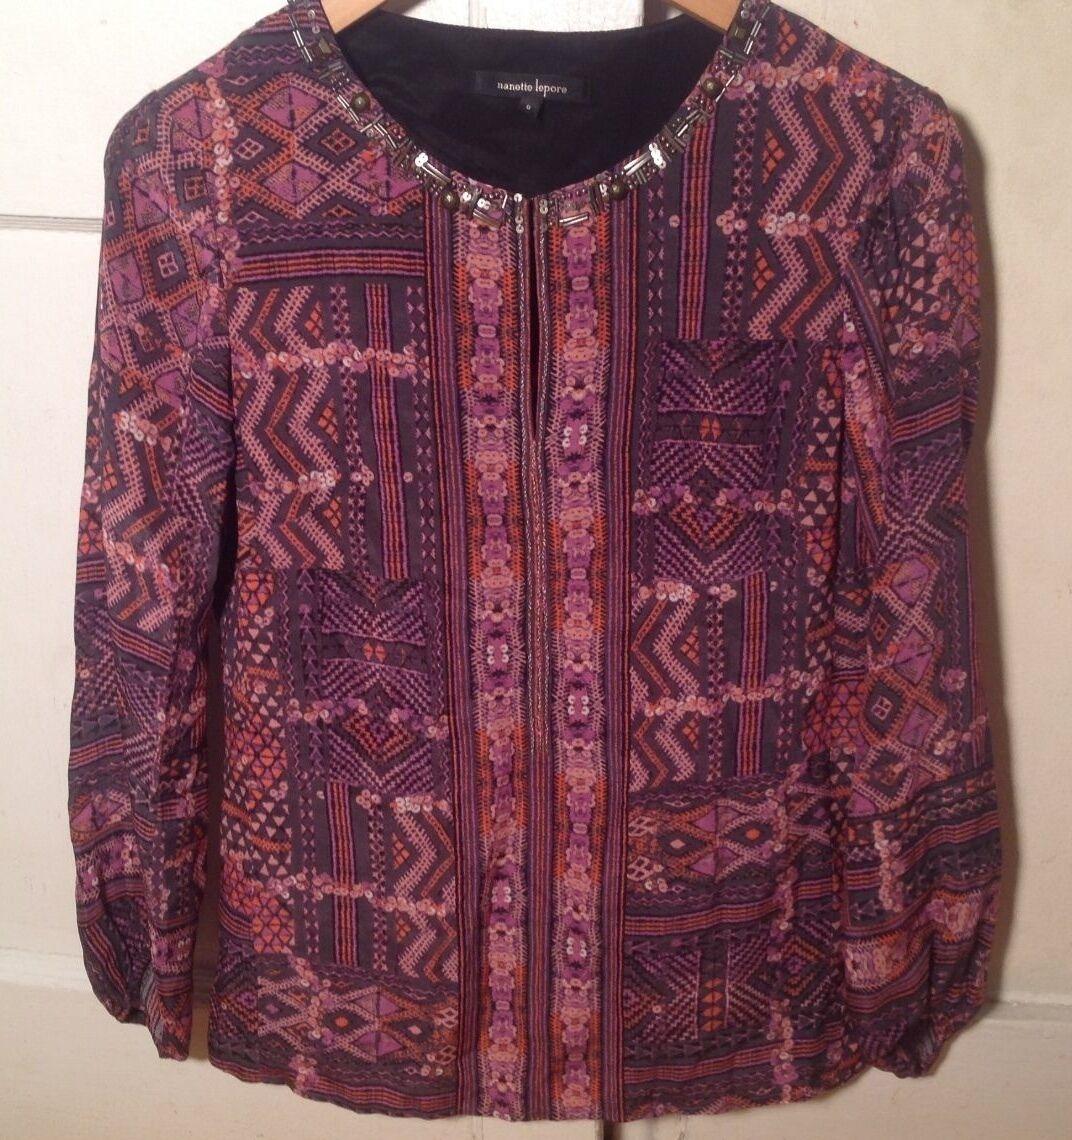 NEW AUTH  NANETTE LEPORE damen lila and Rosa 100% Silk Blouse Shirt Größe 0